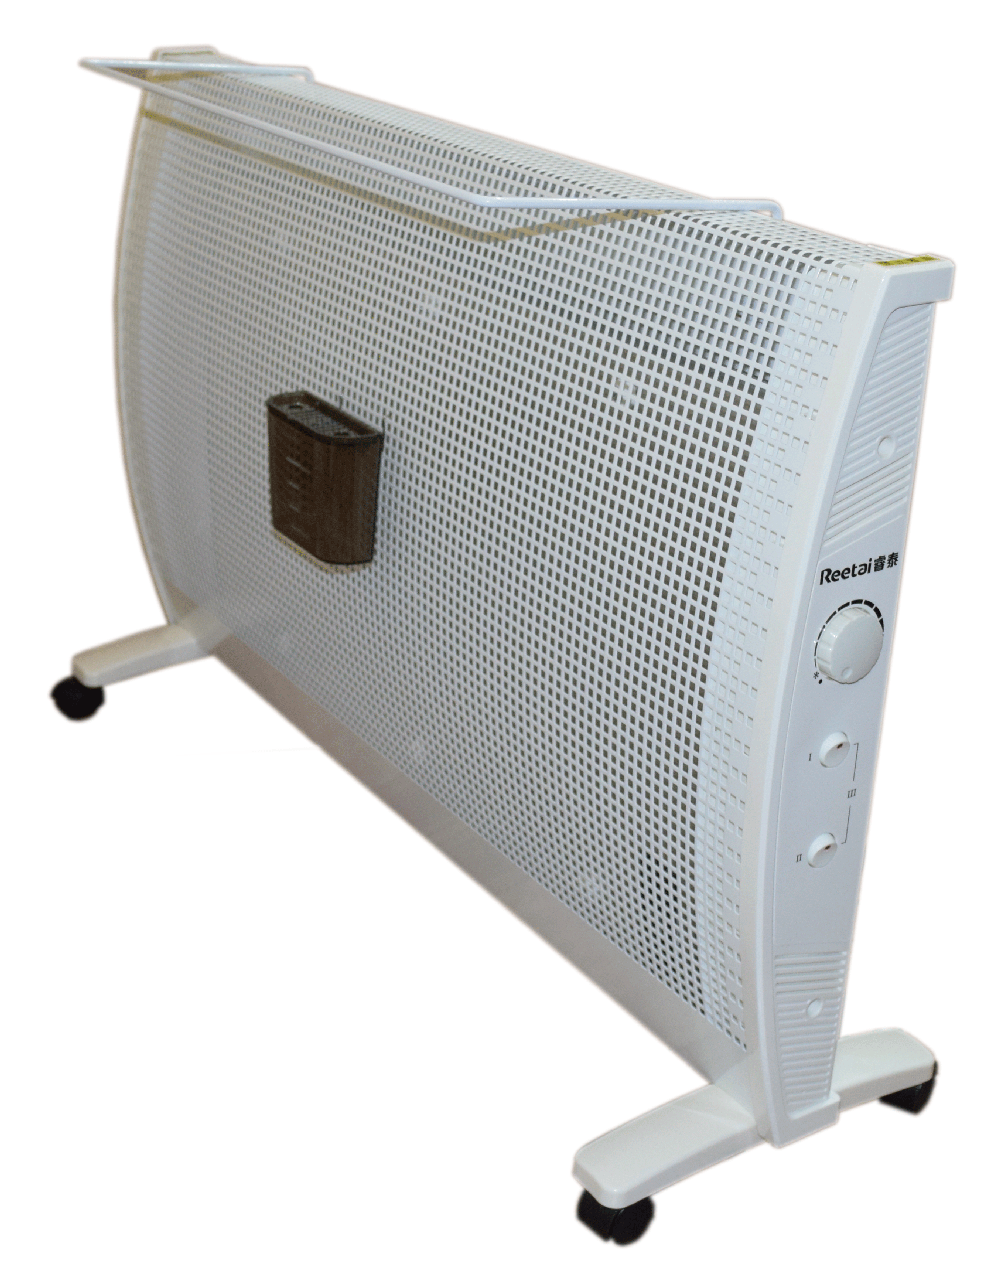 Микатермический обогреватель AirComfort Reetai HP1401-20FS